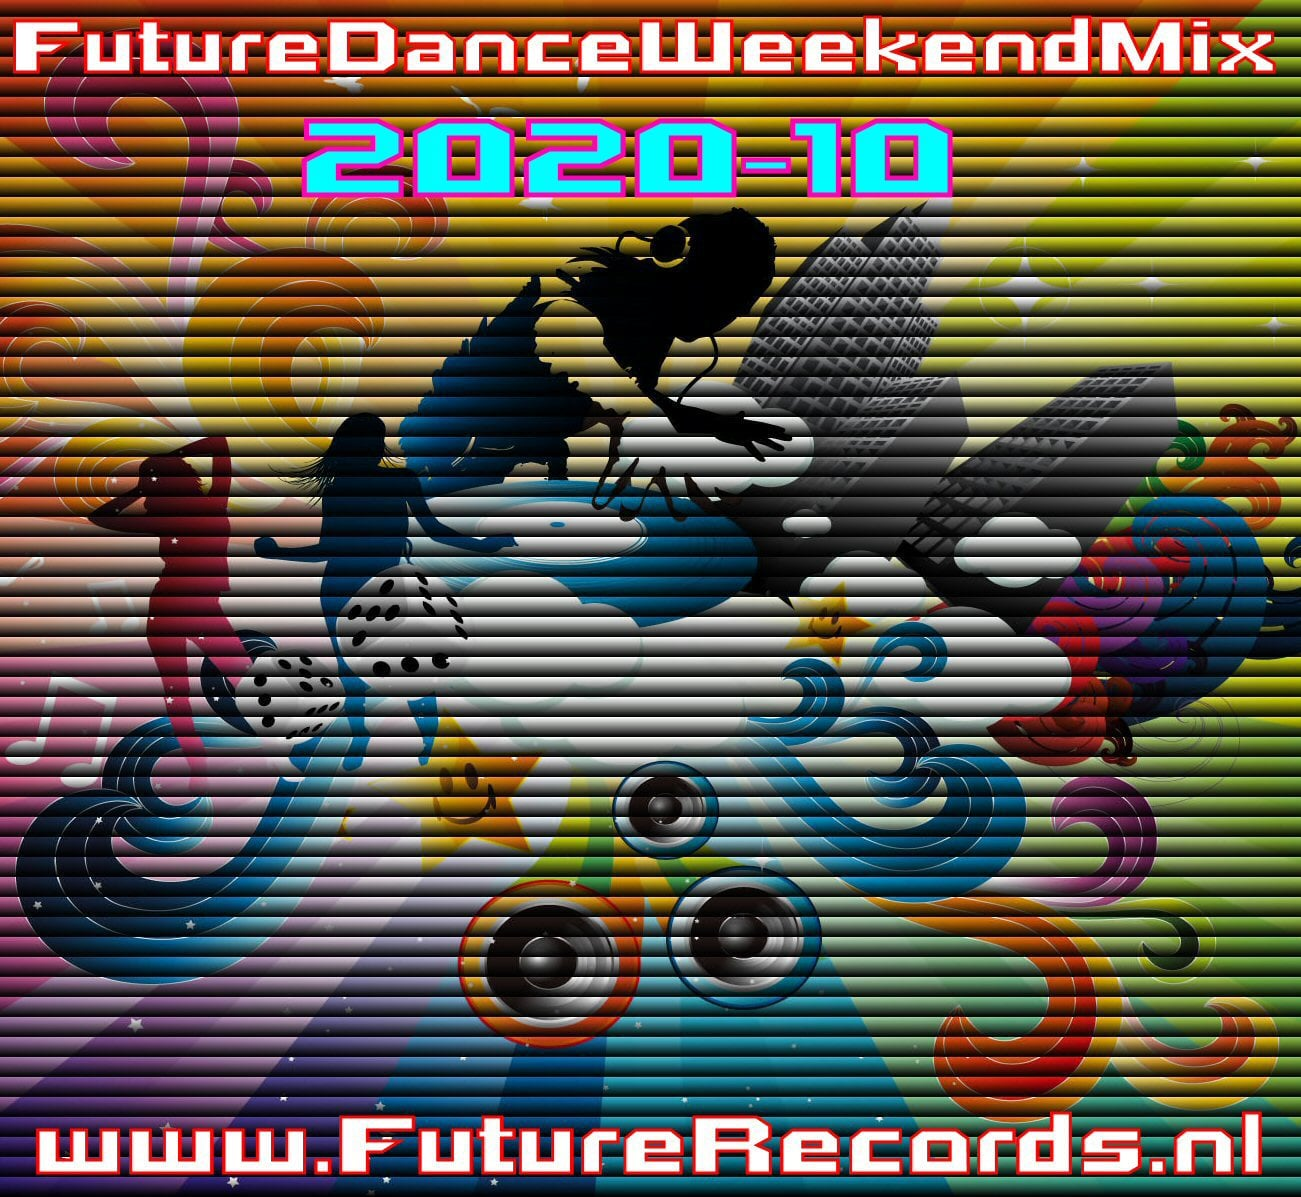 Future Dance Weekend Mix 2020-10